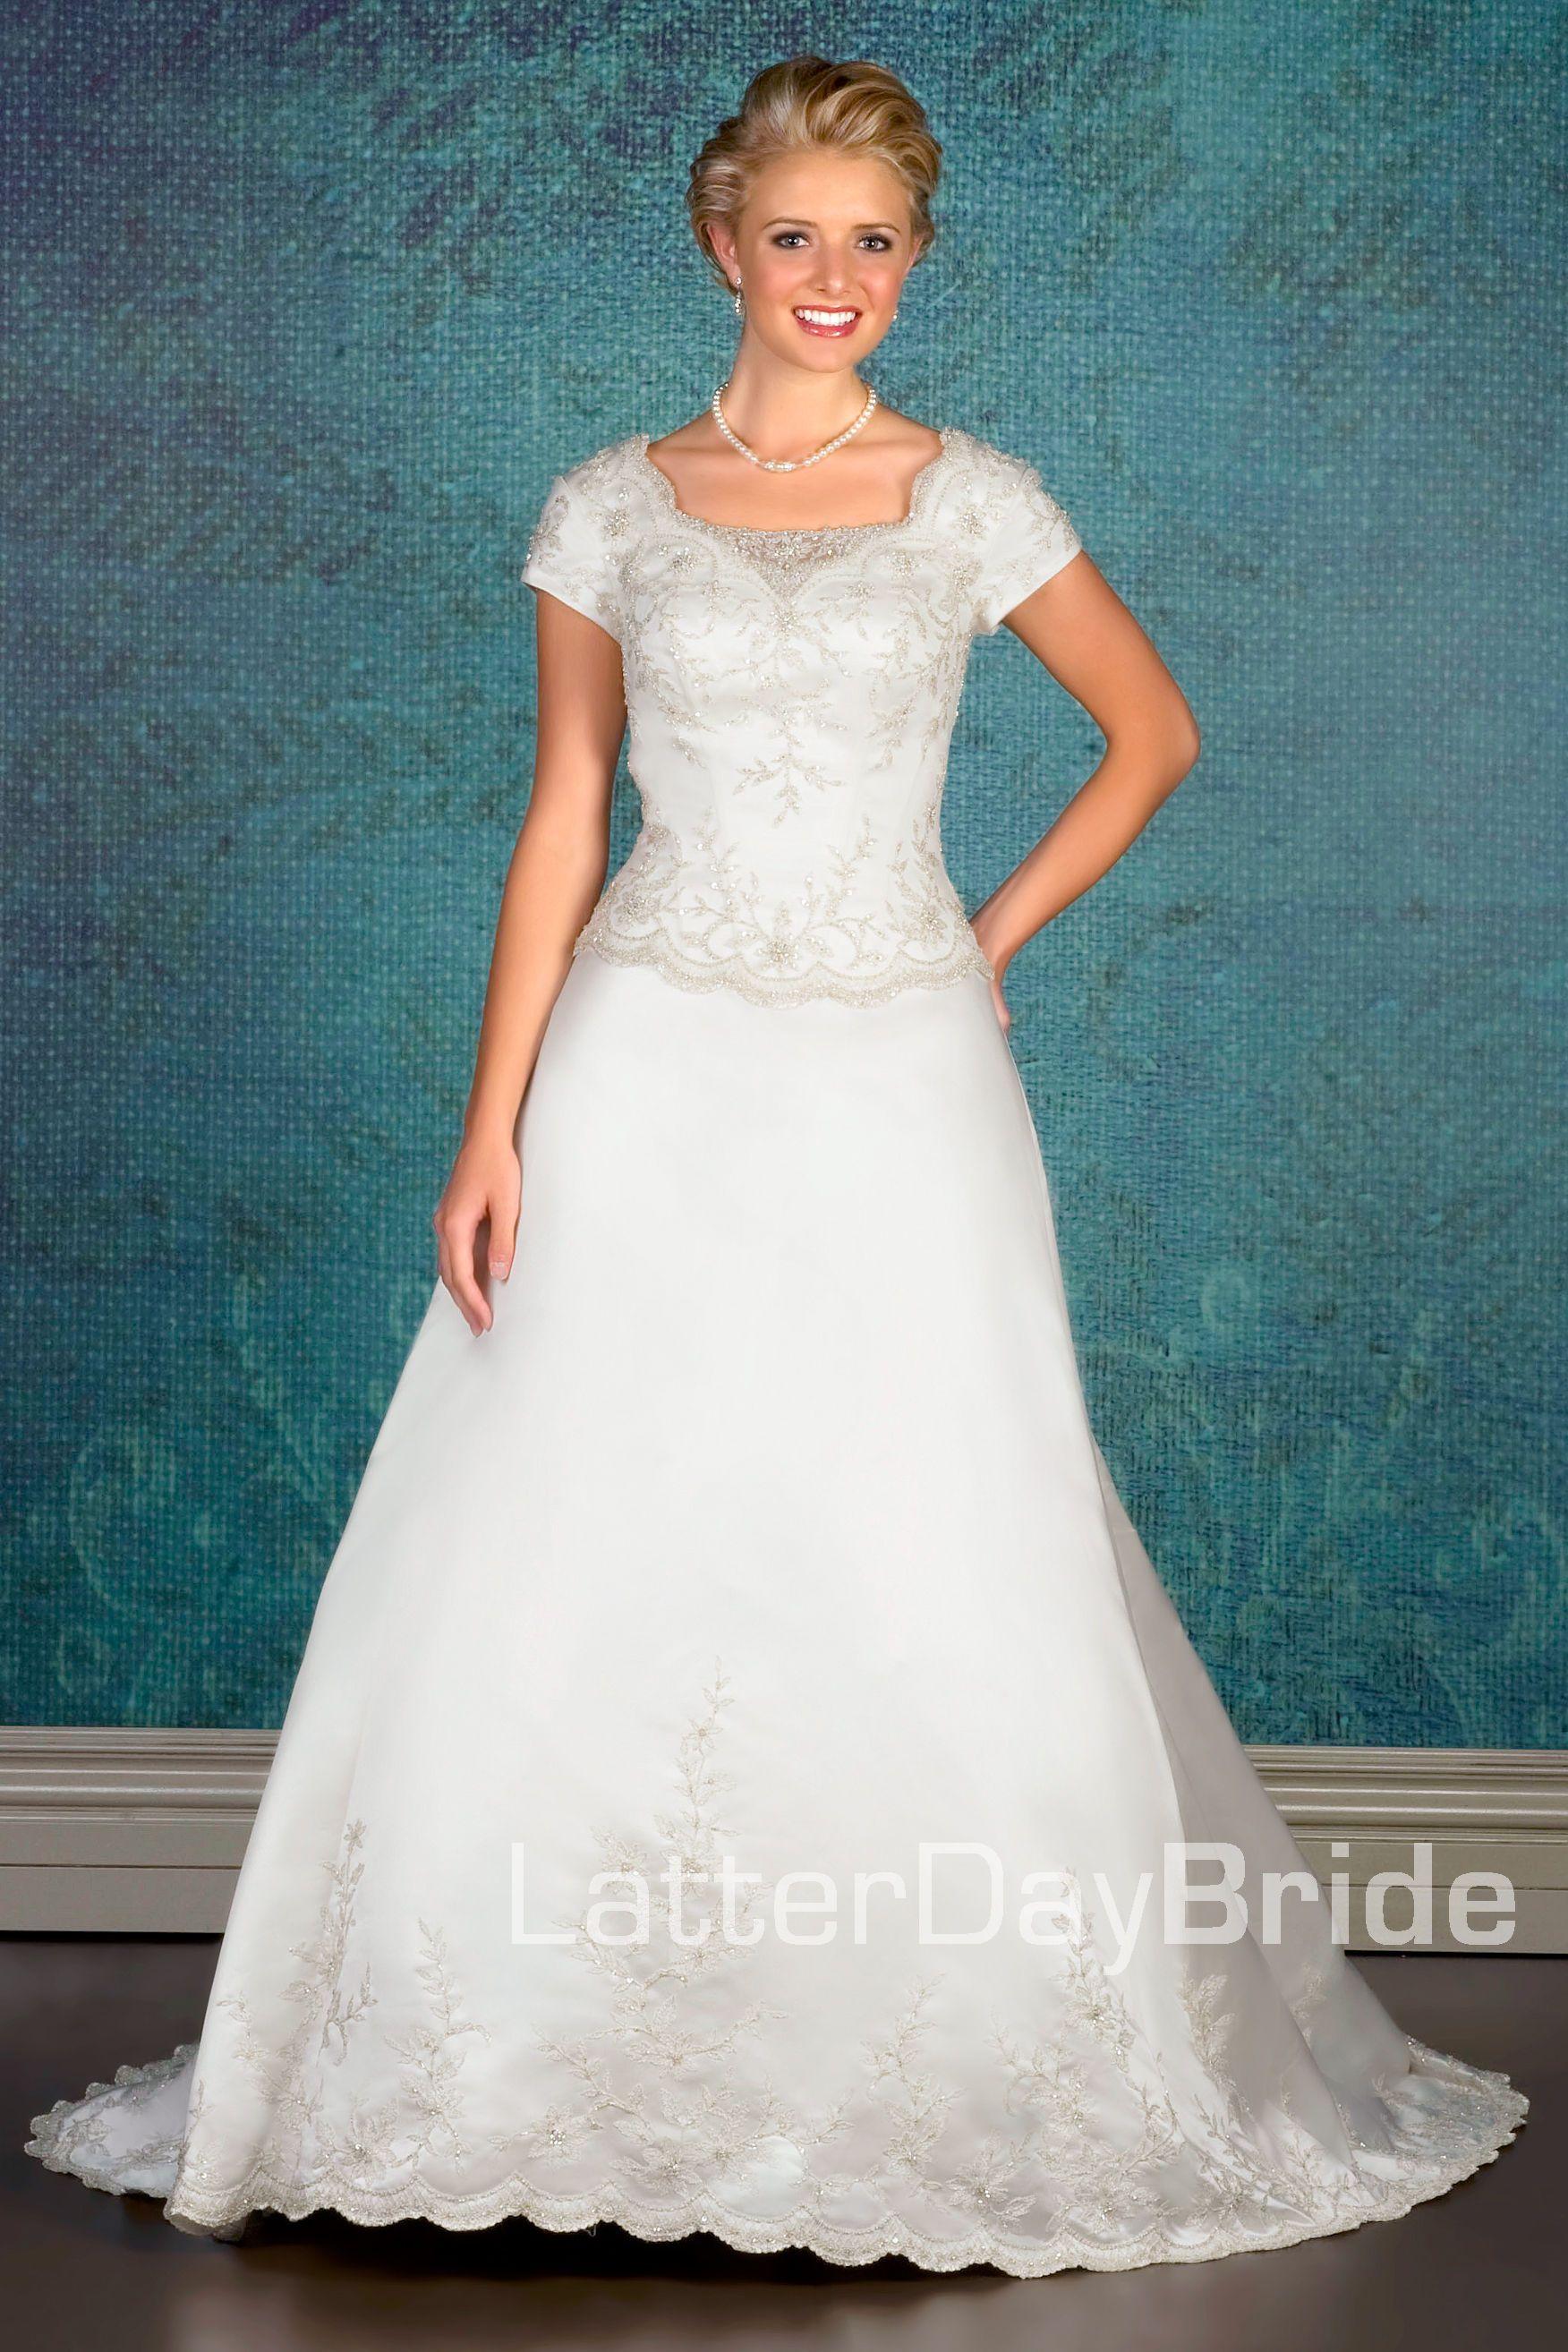 Magnificent Vestidos De Novia Económicos Photos - All Wedding ...